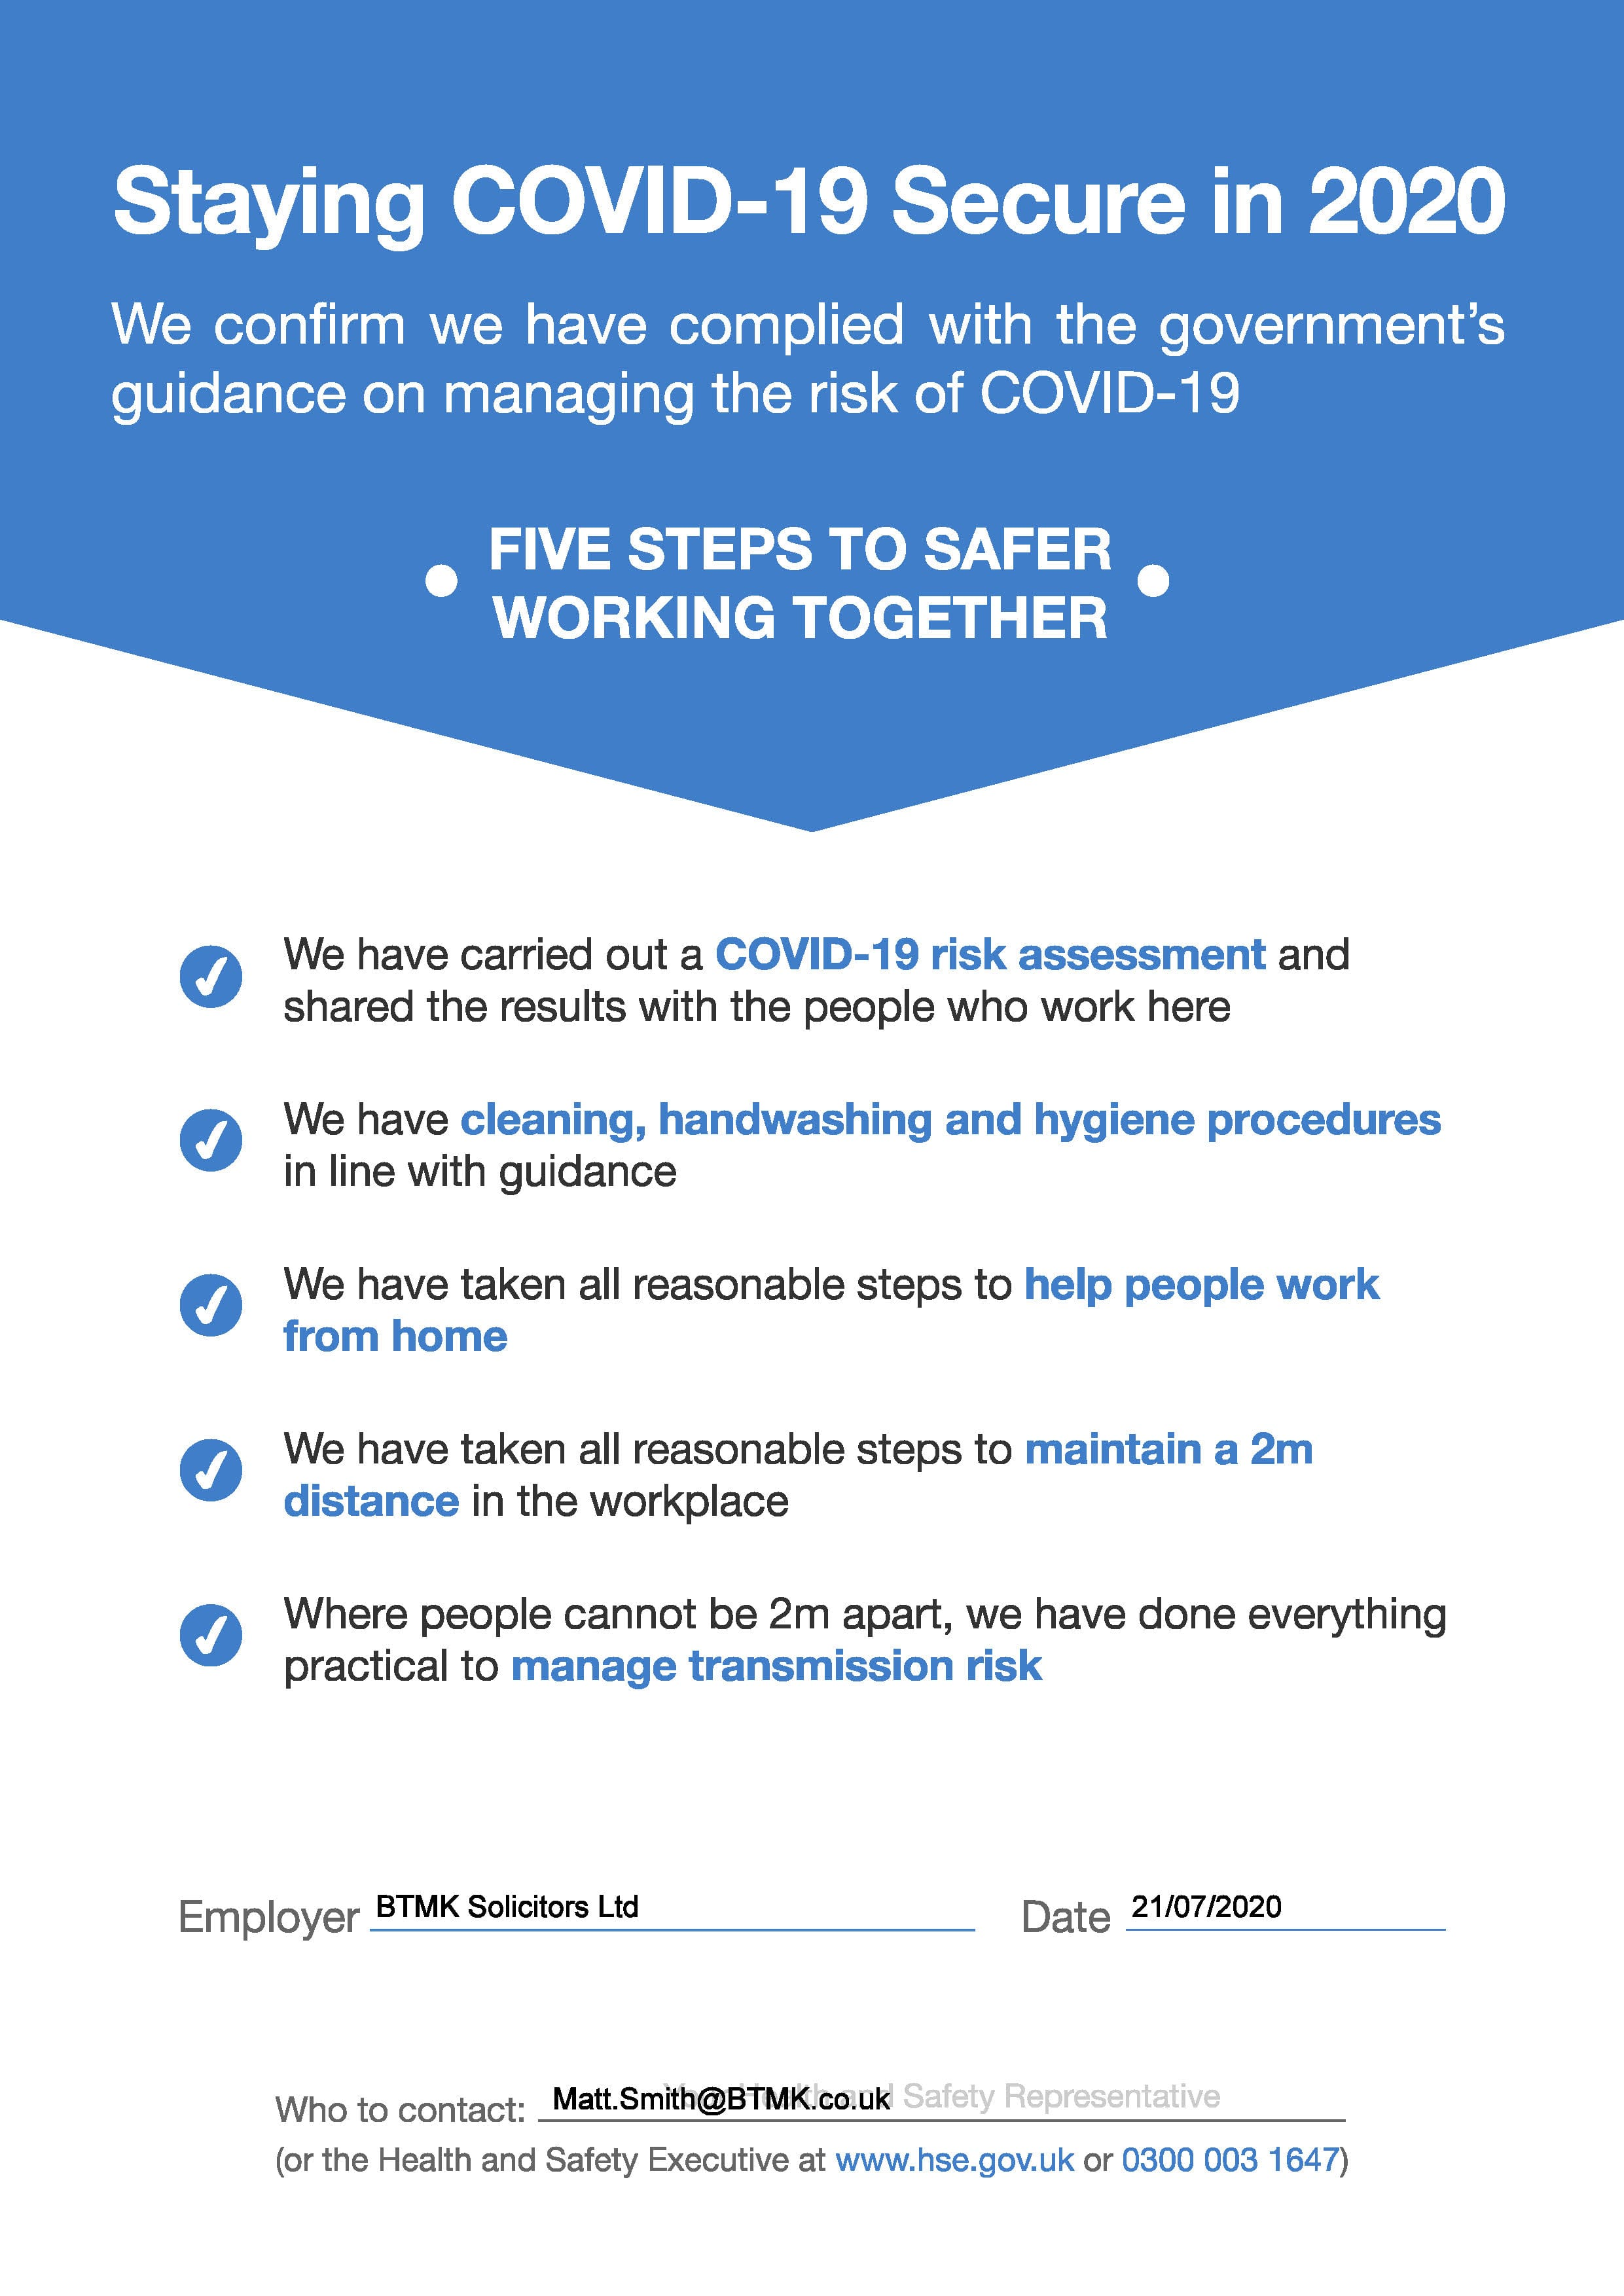 BTMK Covid Compliance Certificate